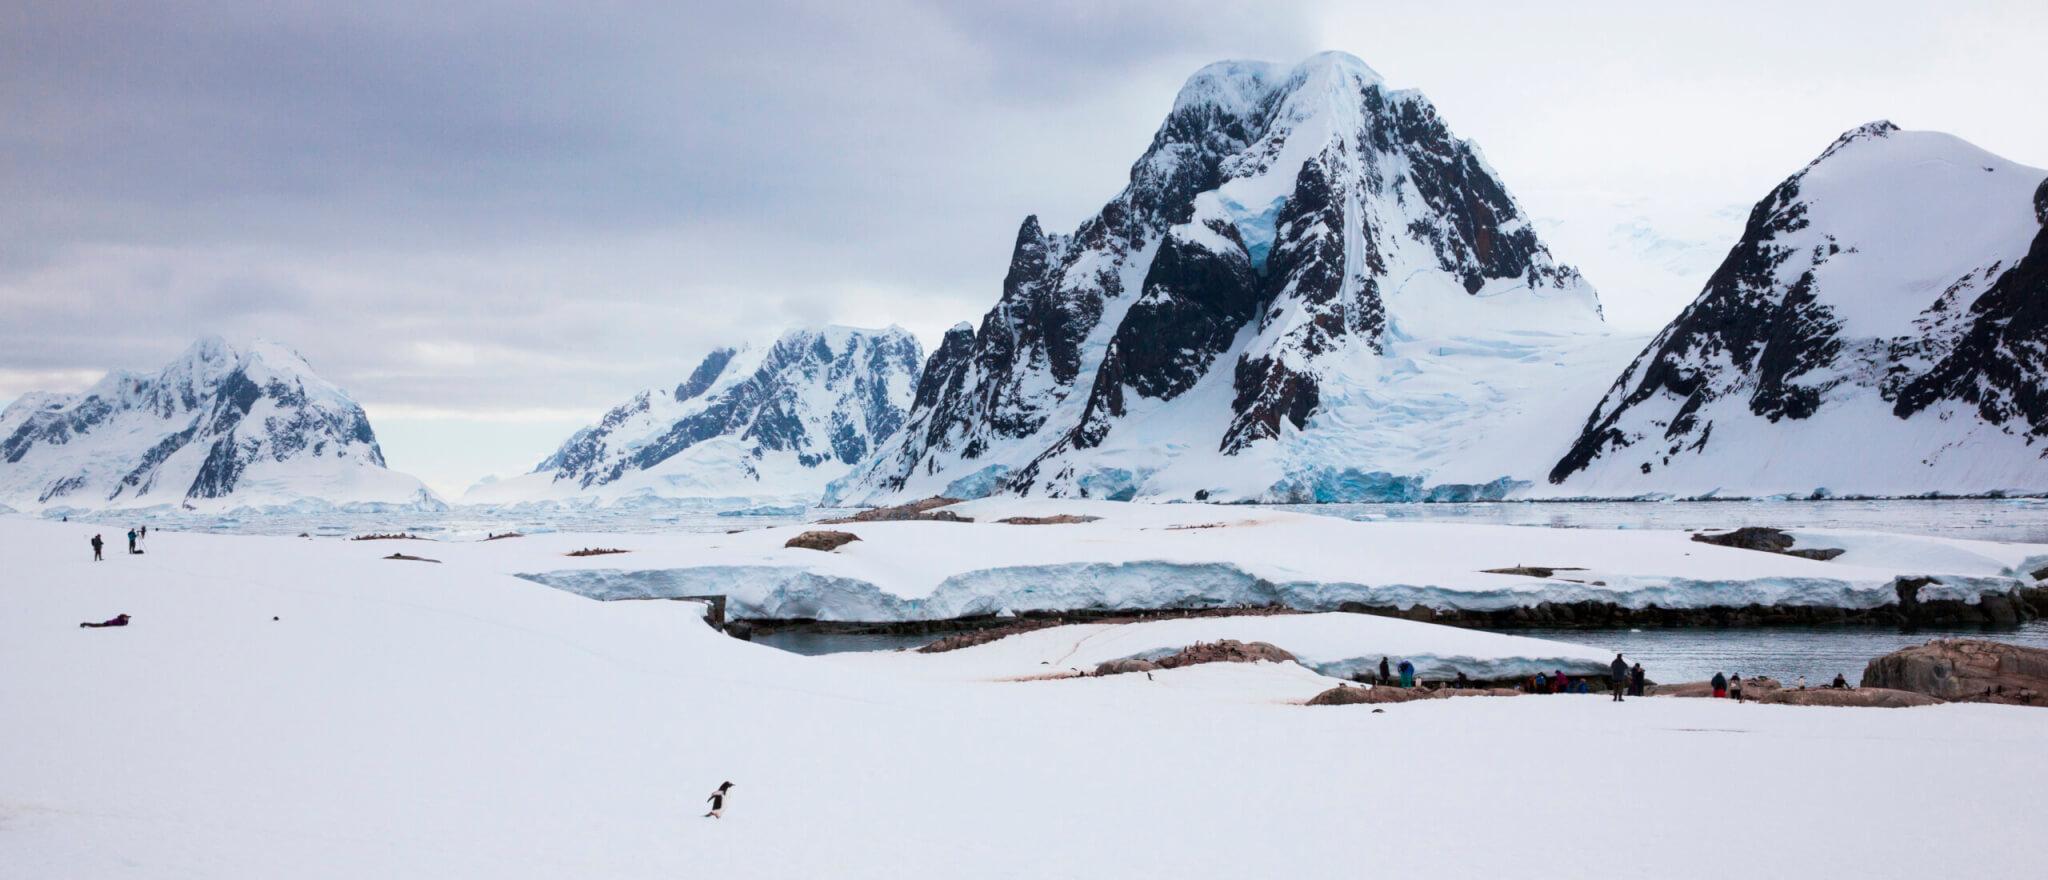 Antarctica sauna magazine 9 BlootGewoon!